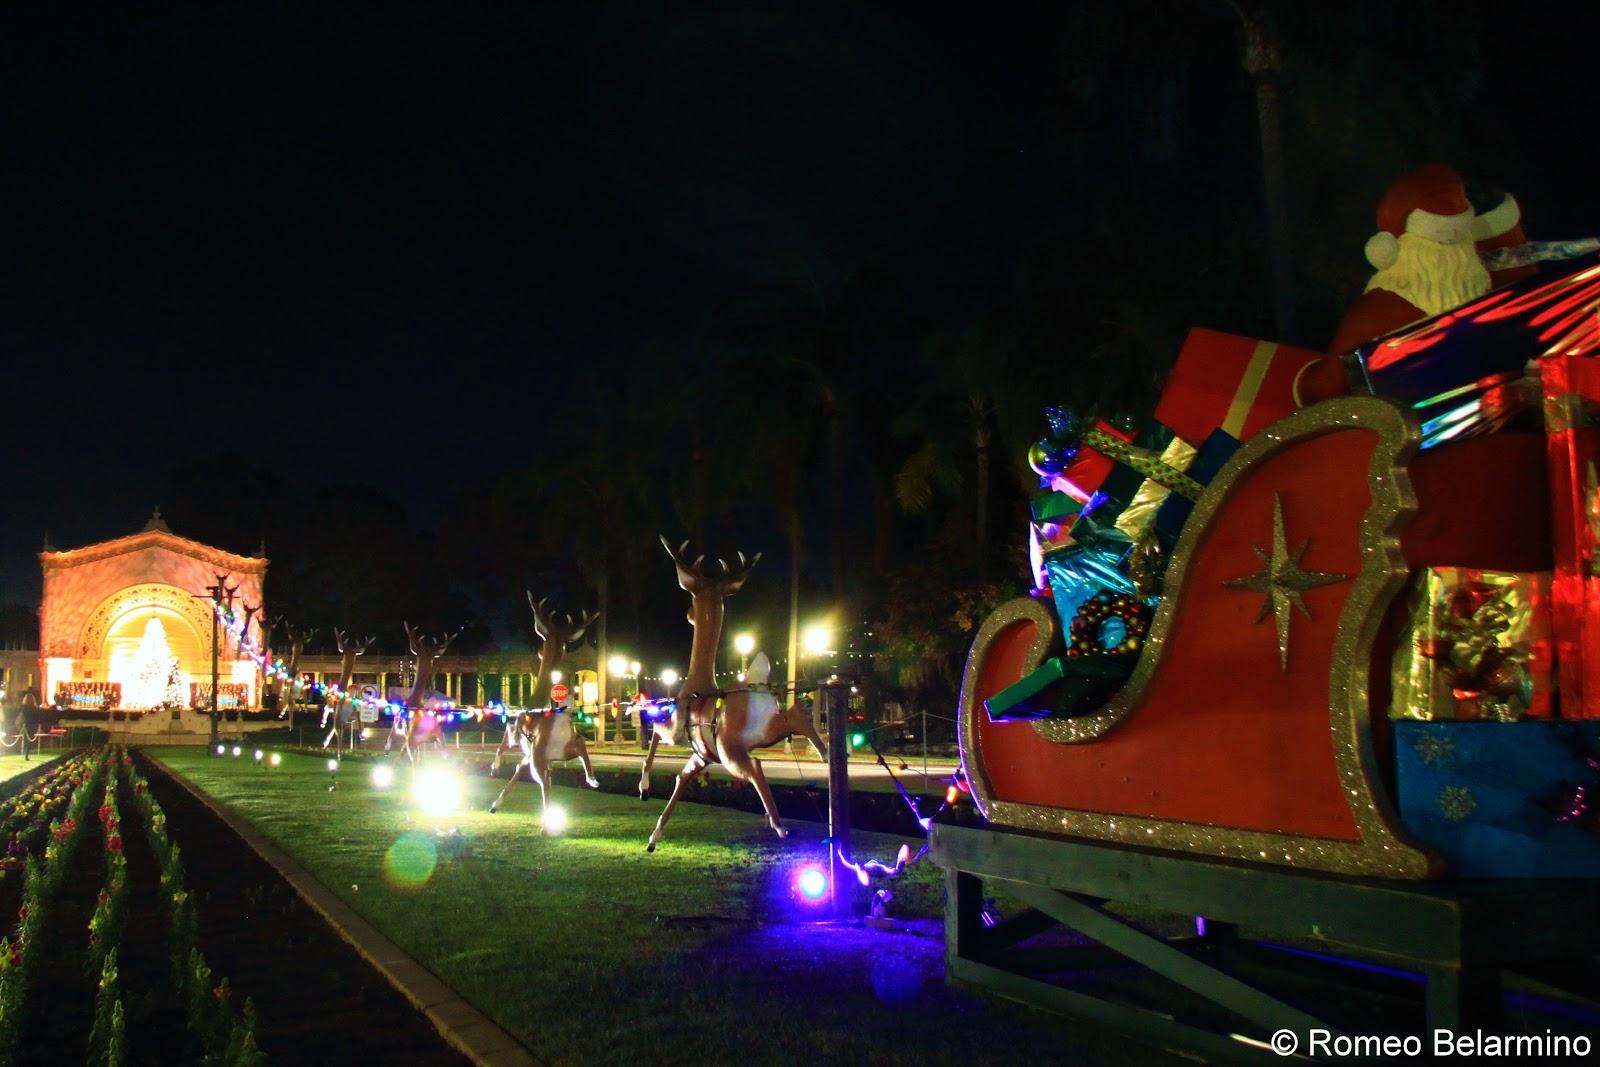 balboa park december nights san diego christmas - Balboa Park Christmas Lights